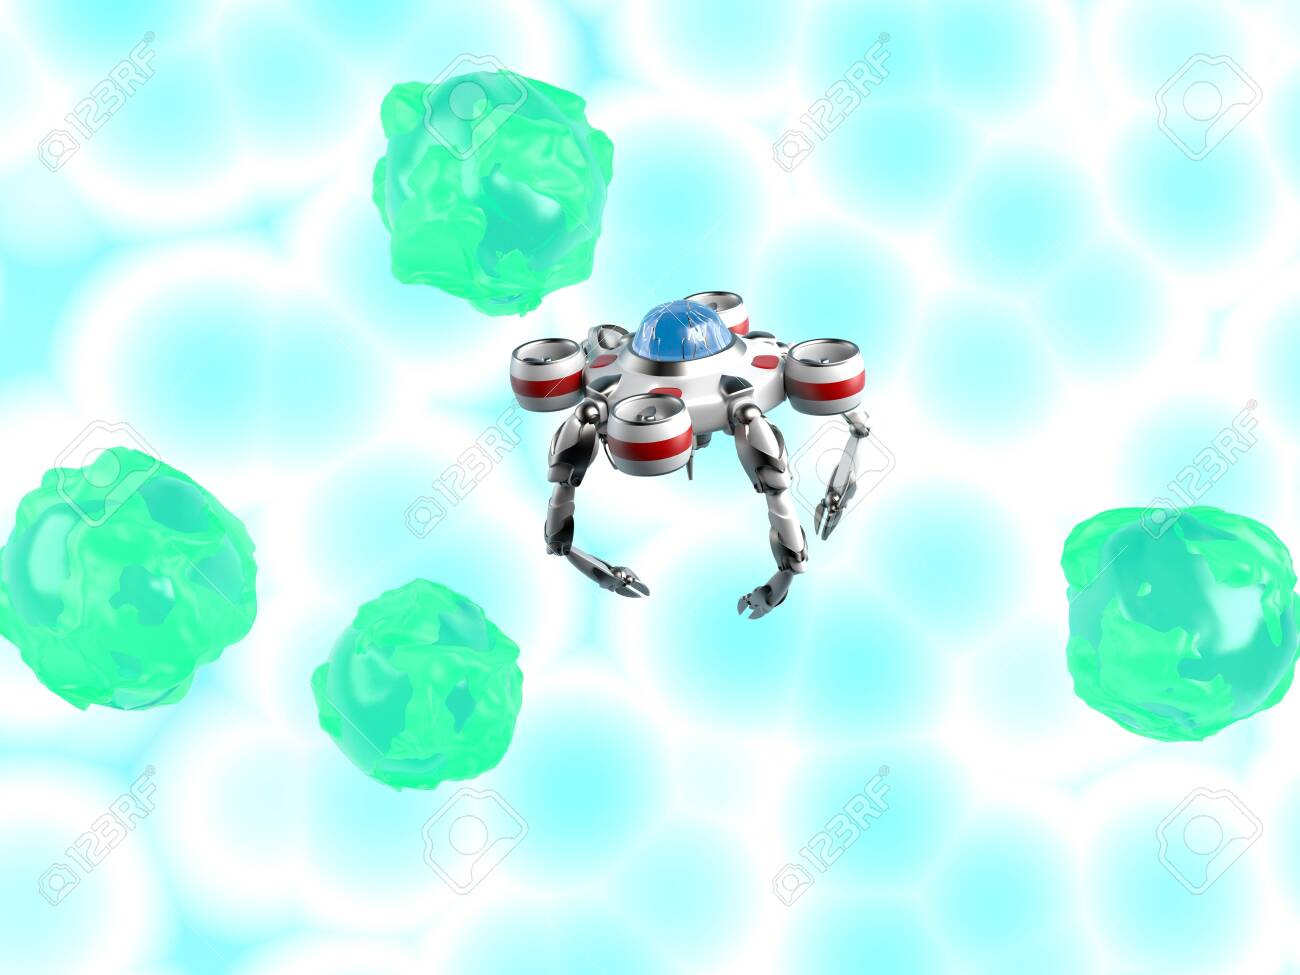 The nano robot with bacteria, Nanobot, Medical concept future,3d render. - 137047459